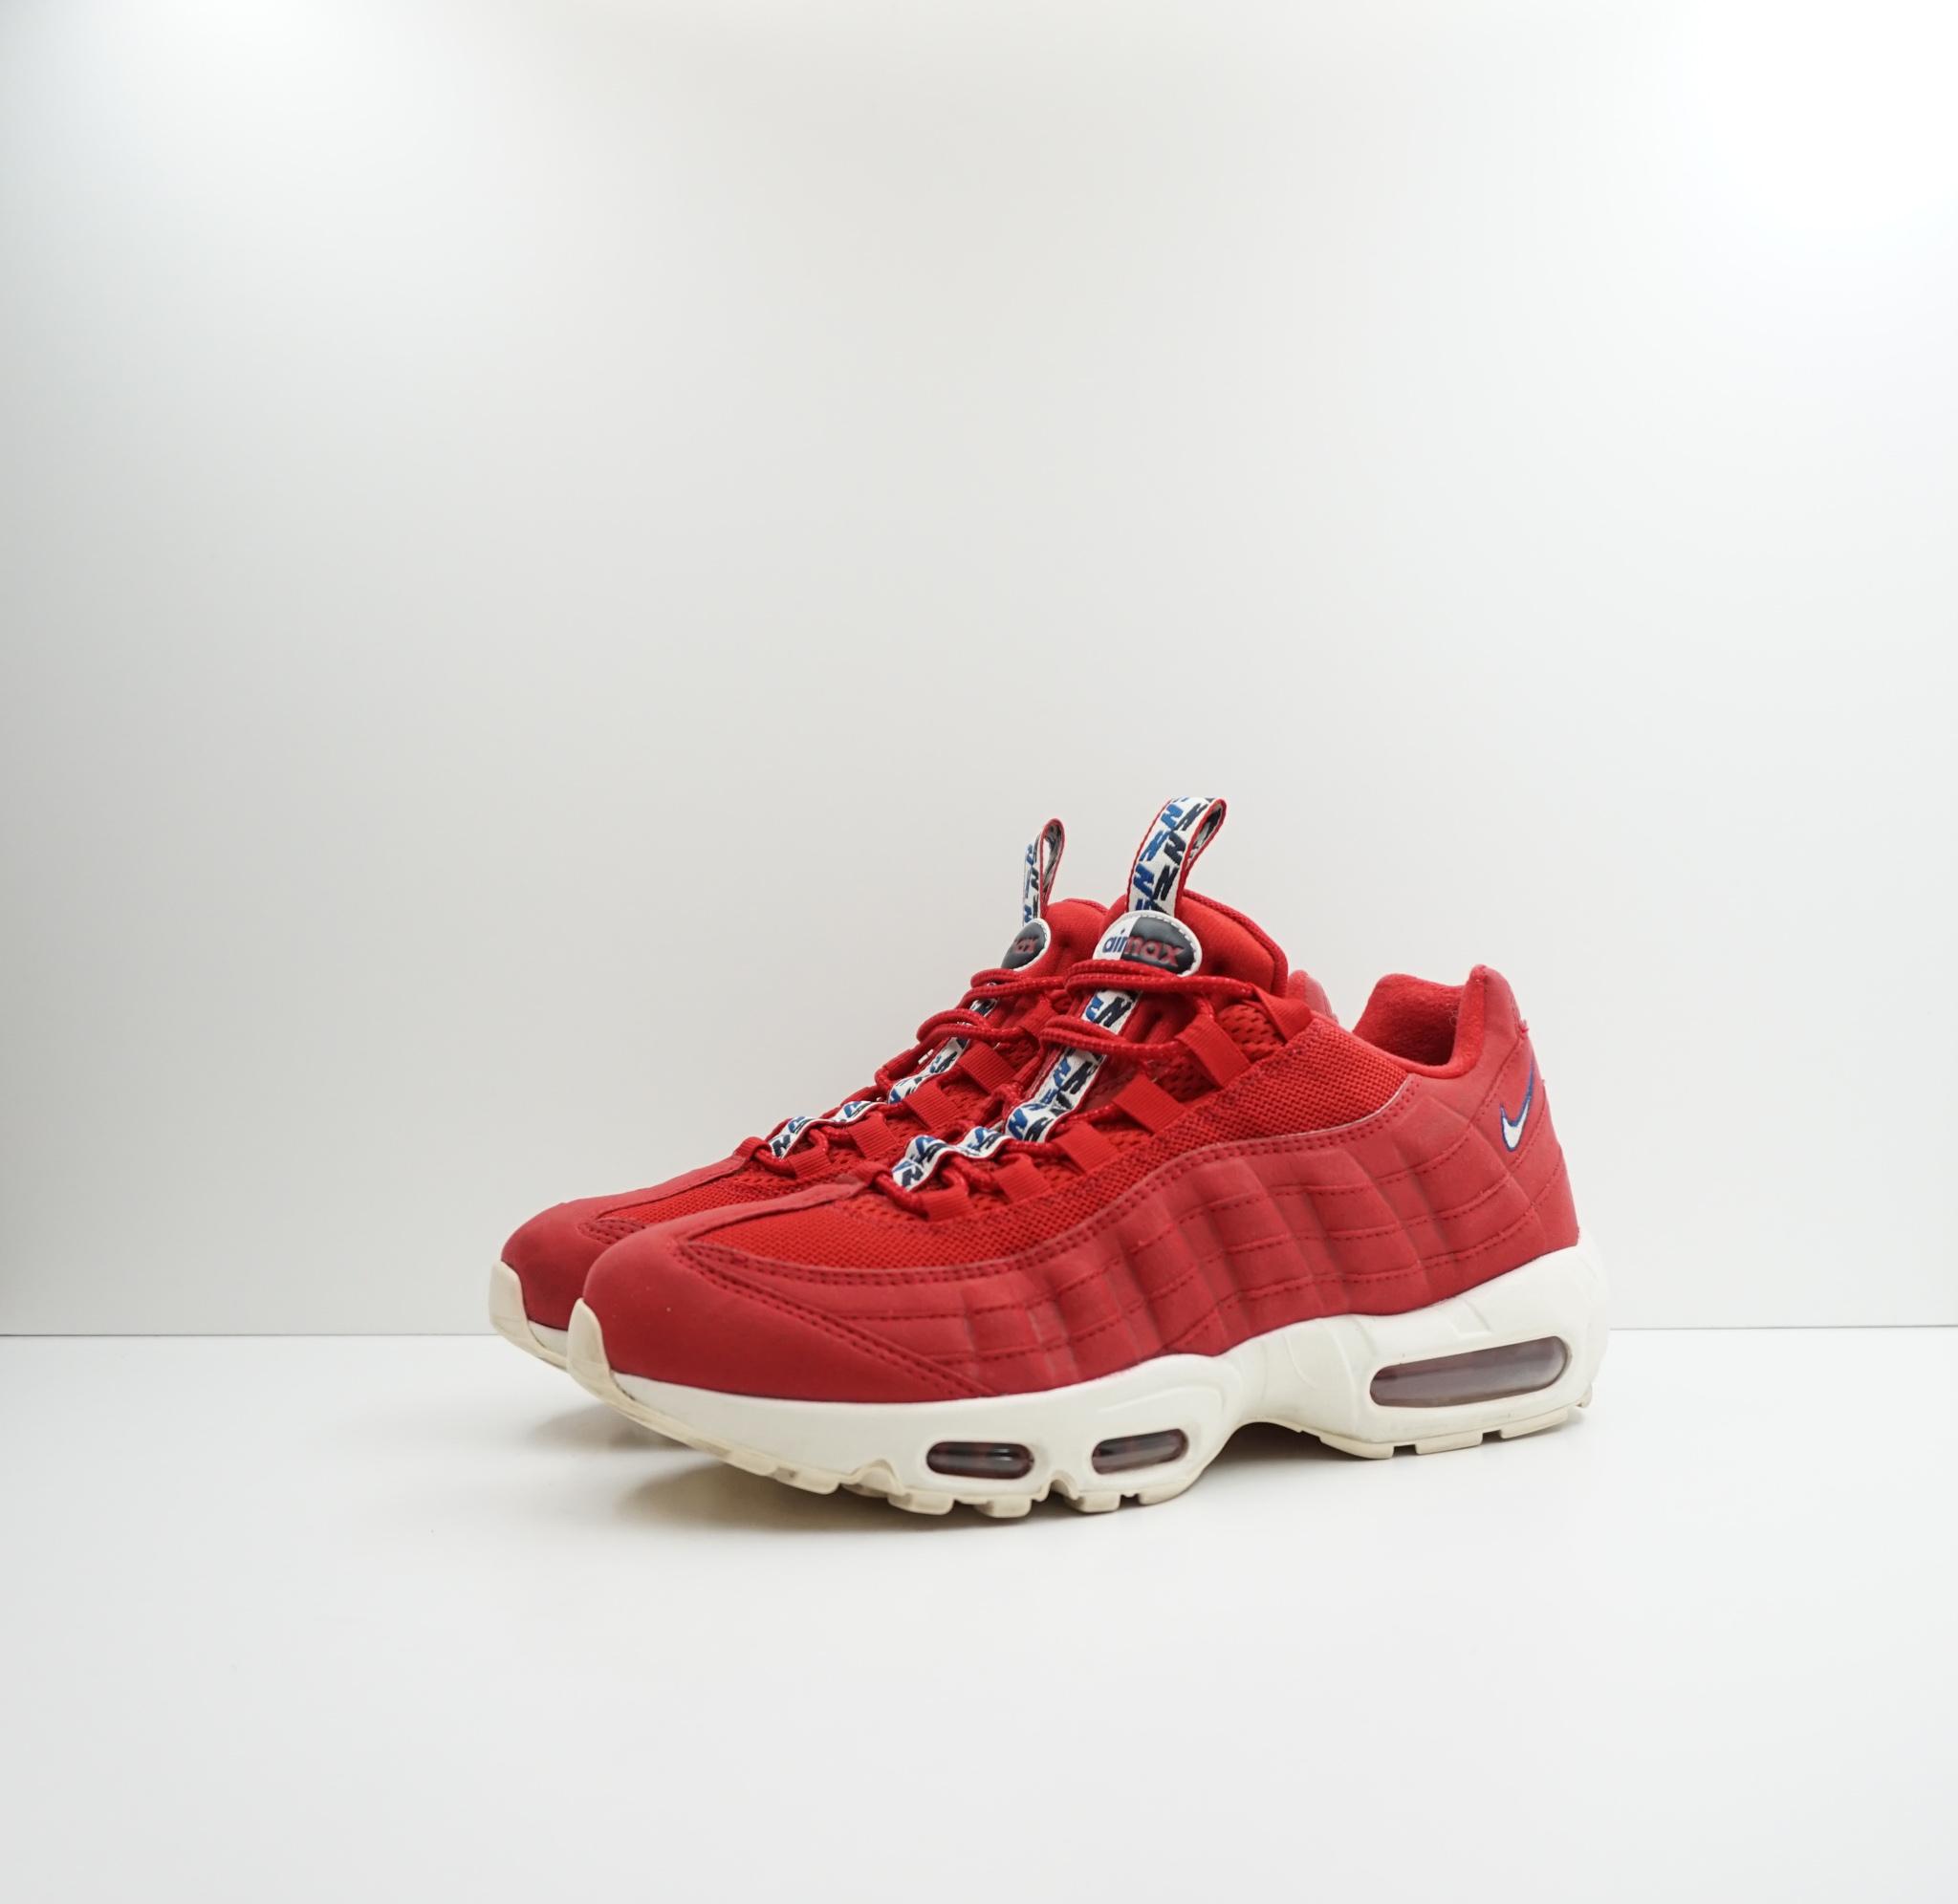 Nike Air Max 95 Pull Tab Red